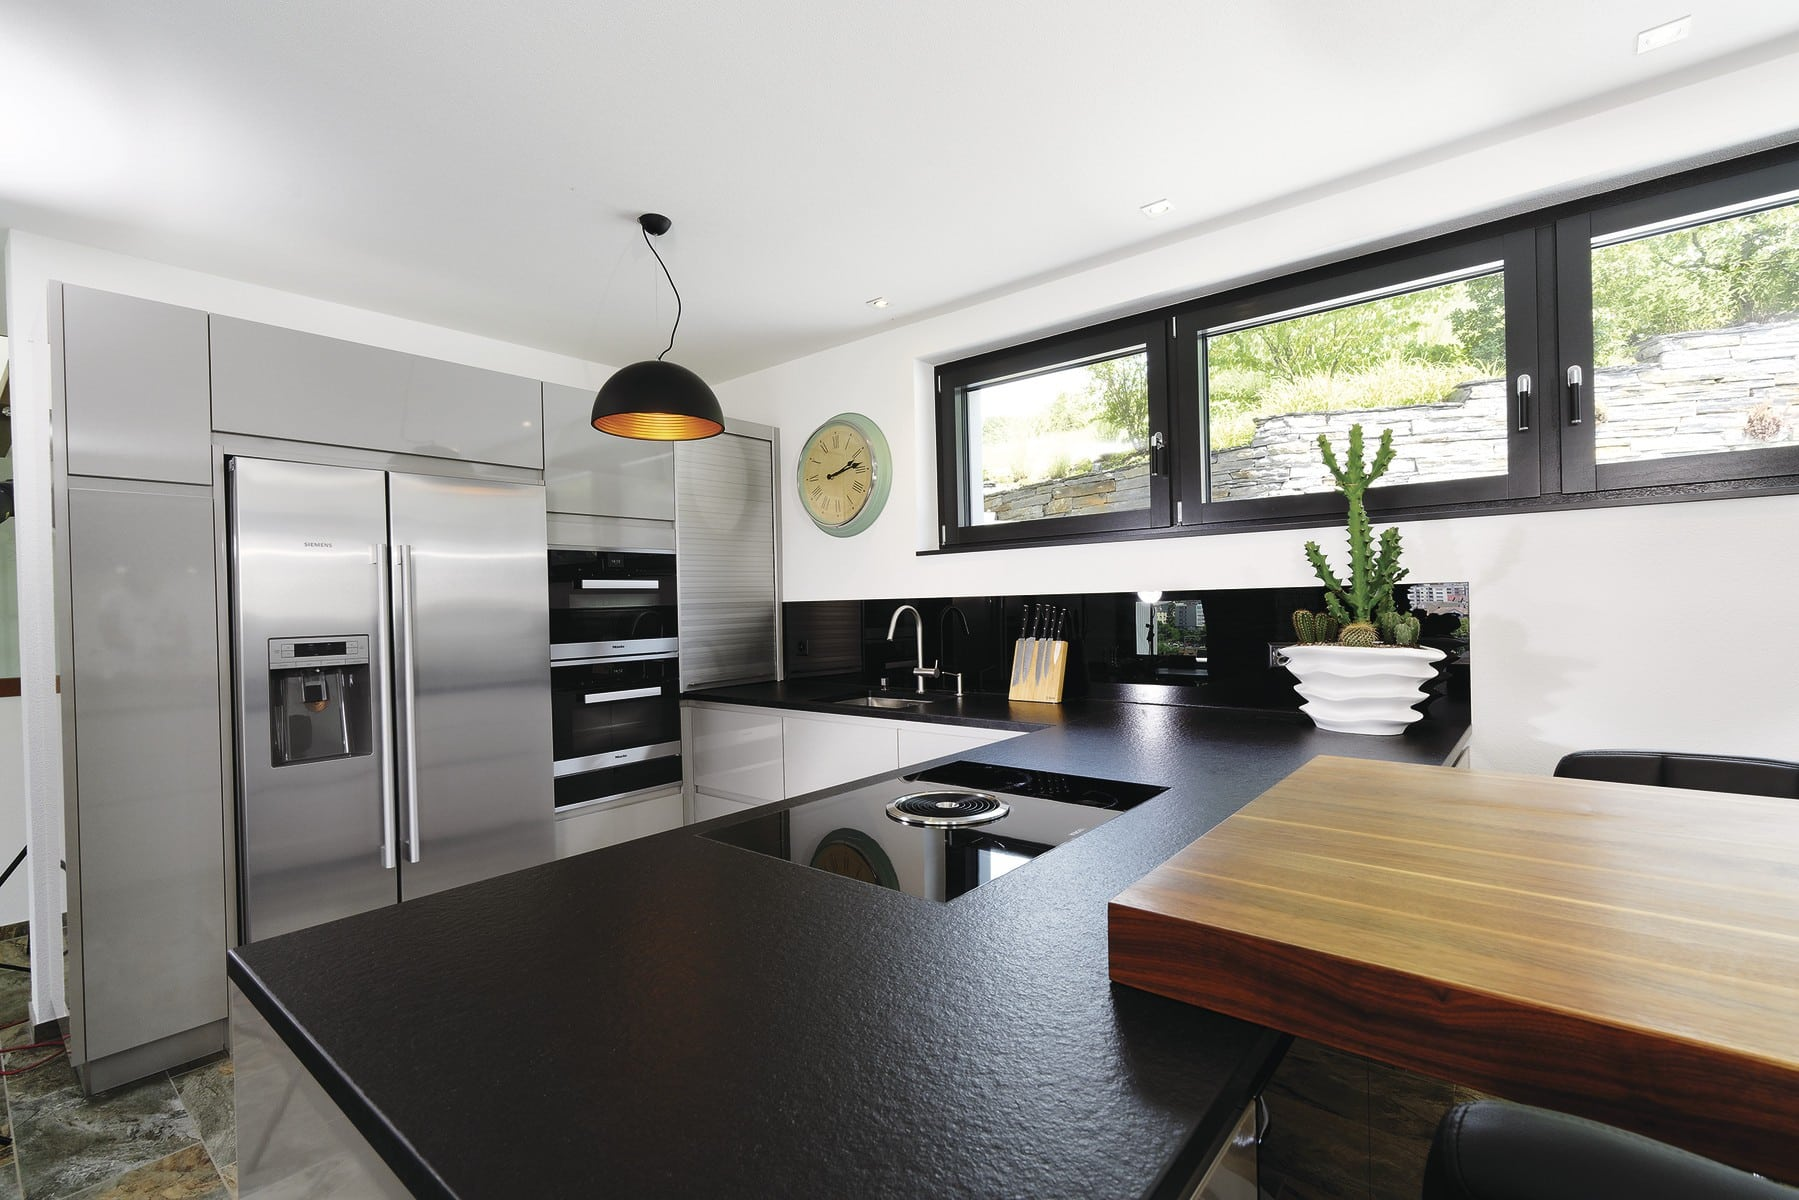 Offene Küche modern mit Theke und Oberlicht - Inneneinrichtung Ideen Doppelhaus WeberHaus Fertighaus - HausbauDirekt.de